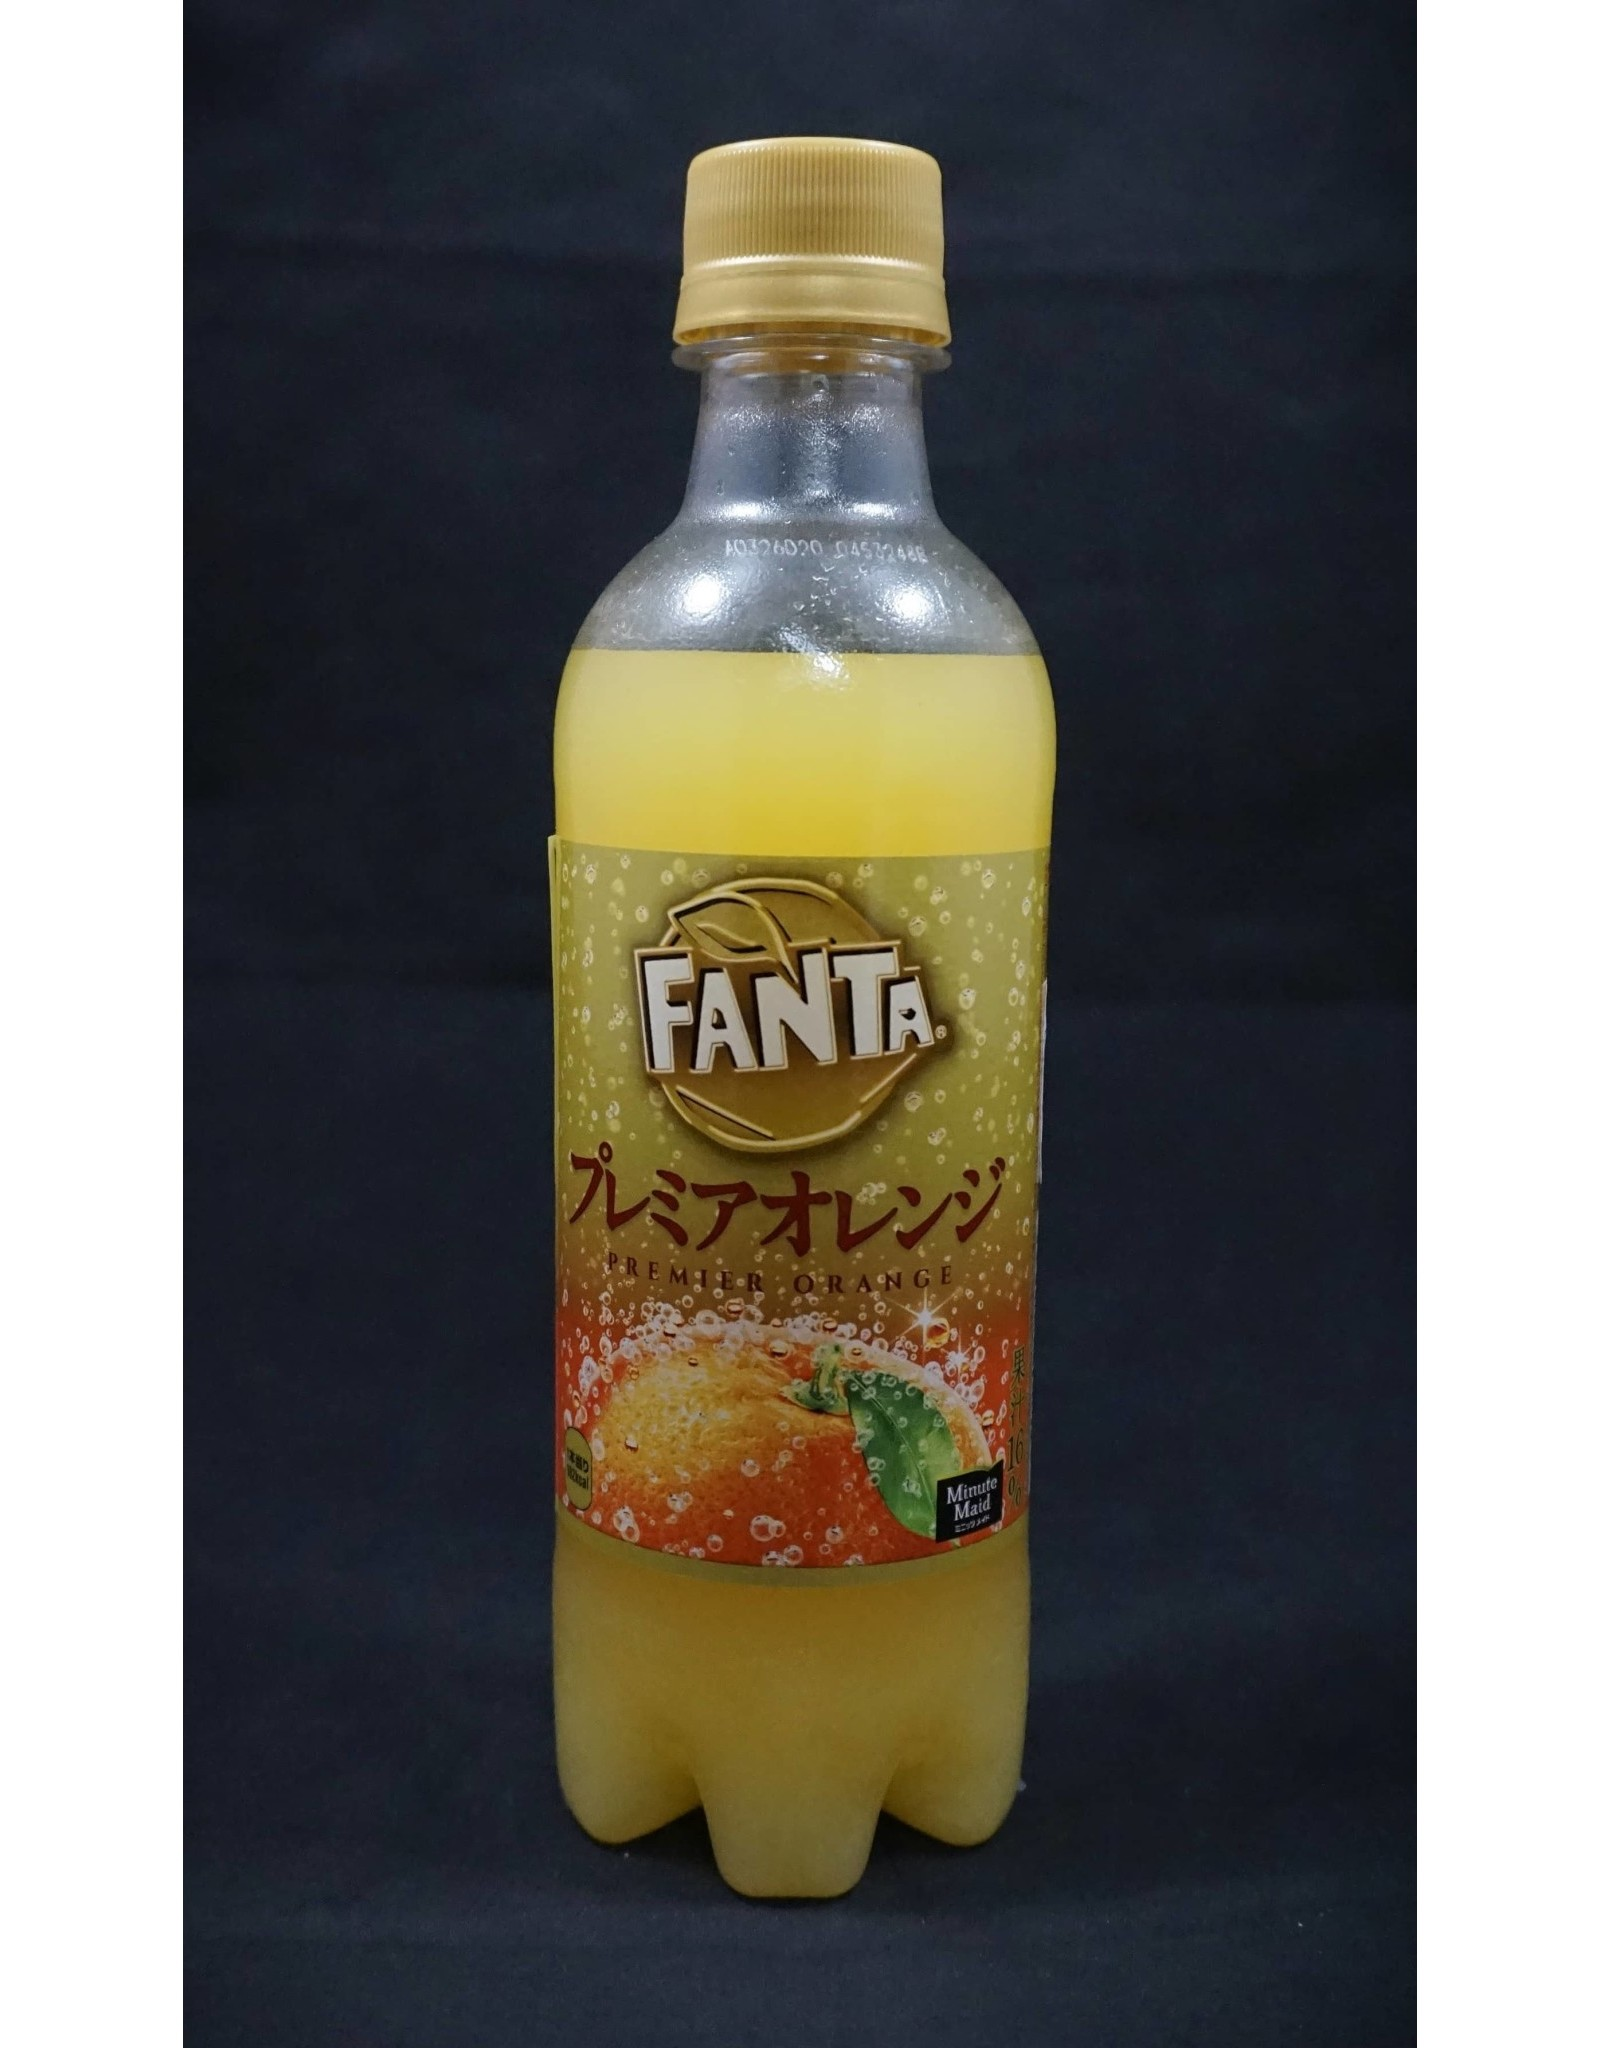 Fanta Fanta x Minute Maid Premier Orange Japan